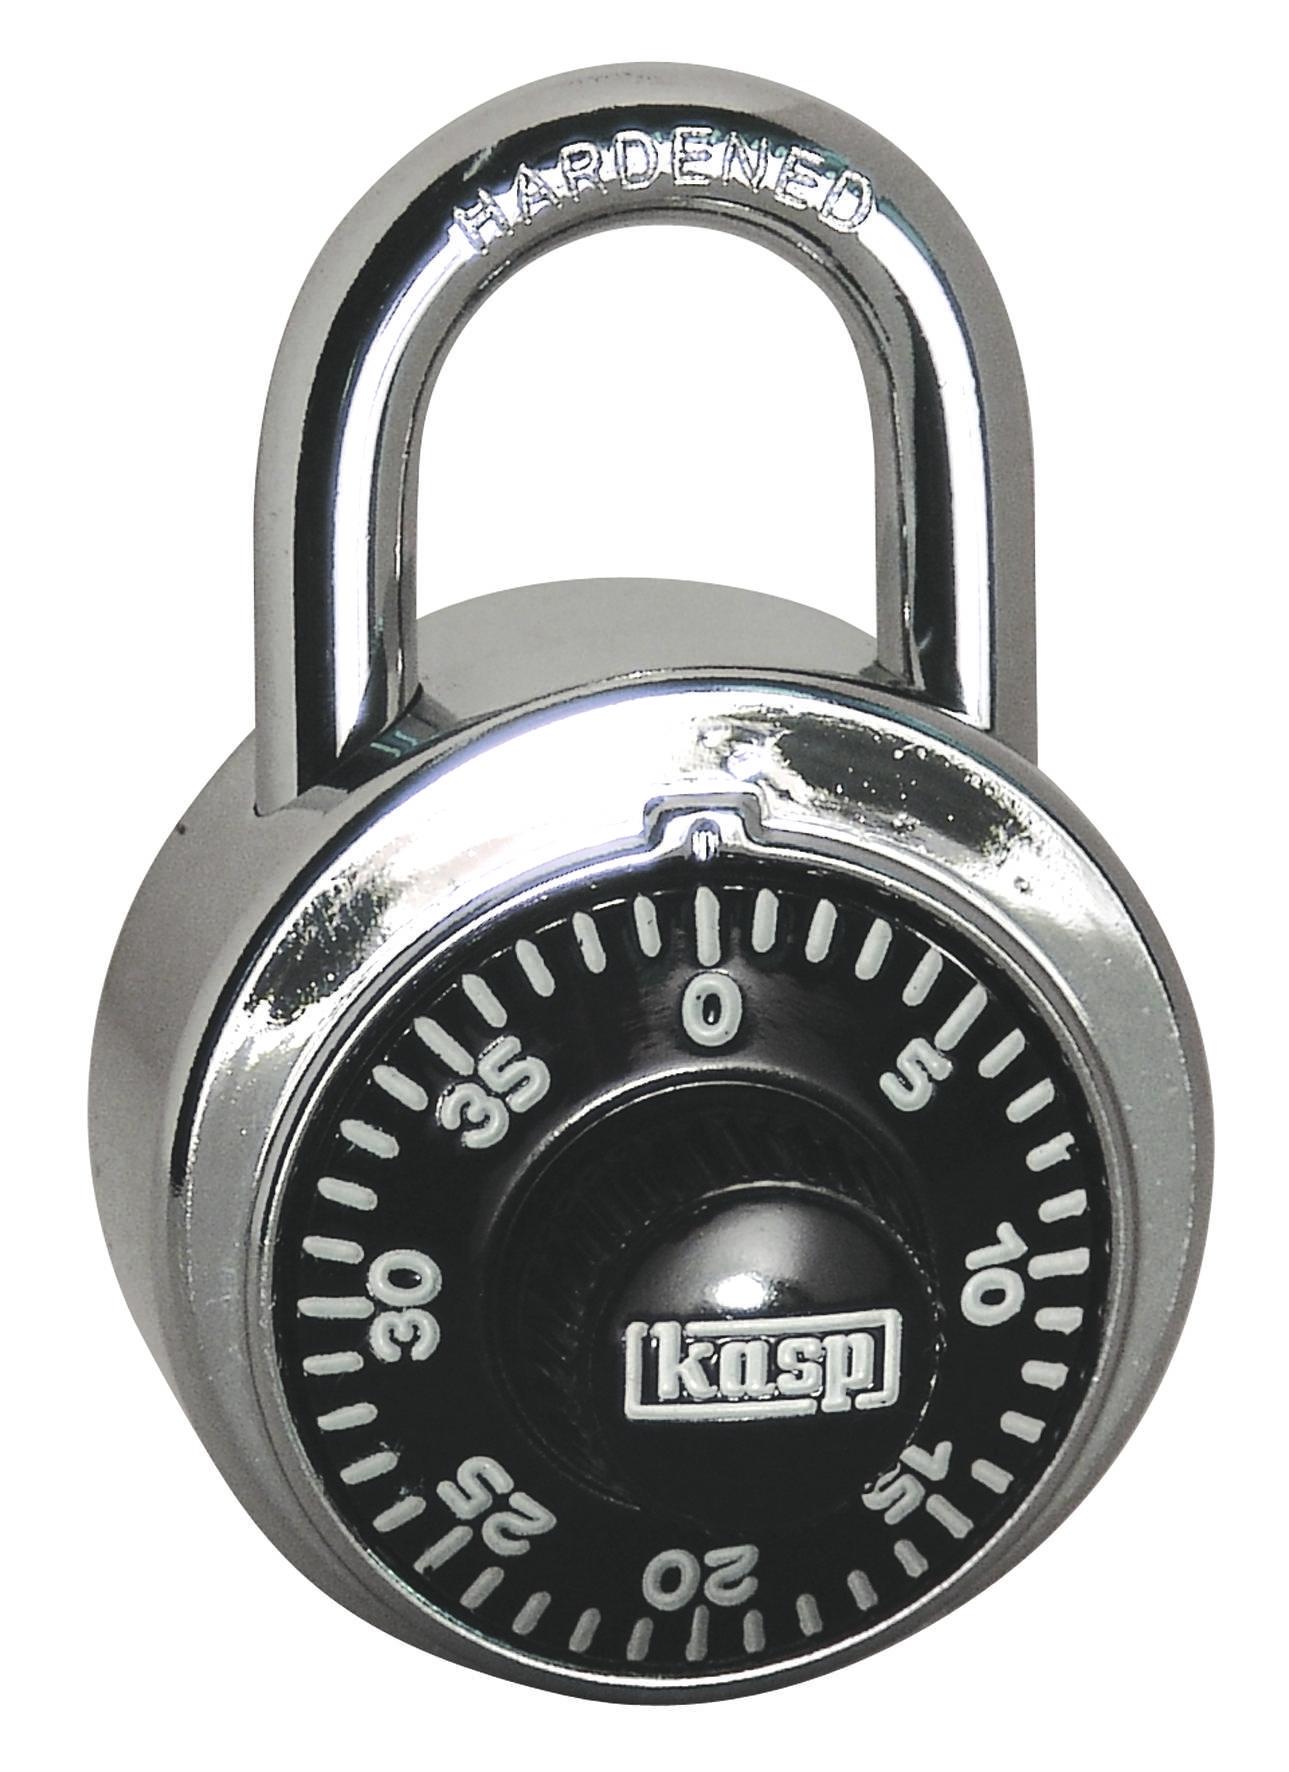 Visiaci zámok s číselnou kombináciou Kasp K11548D, okrúhly